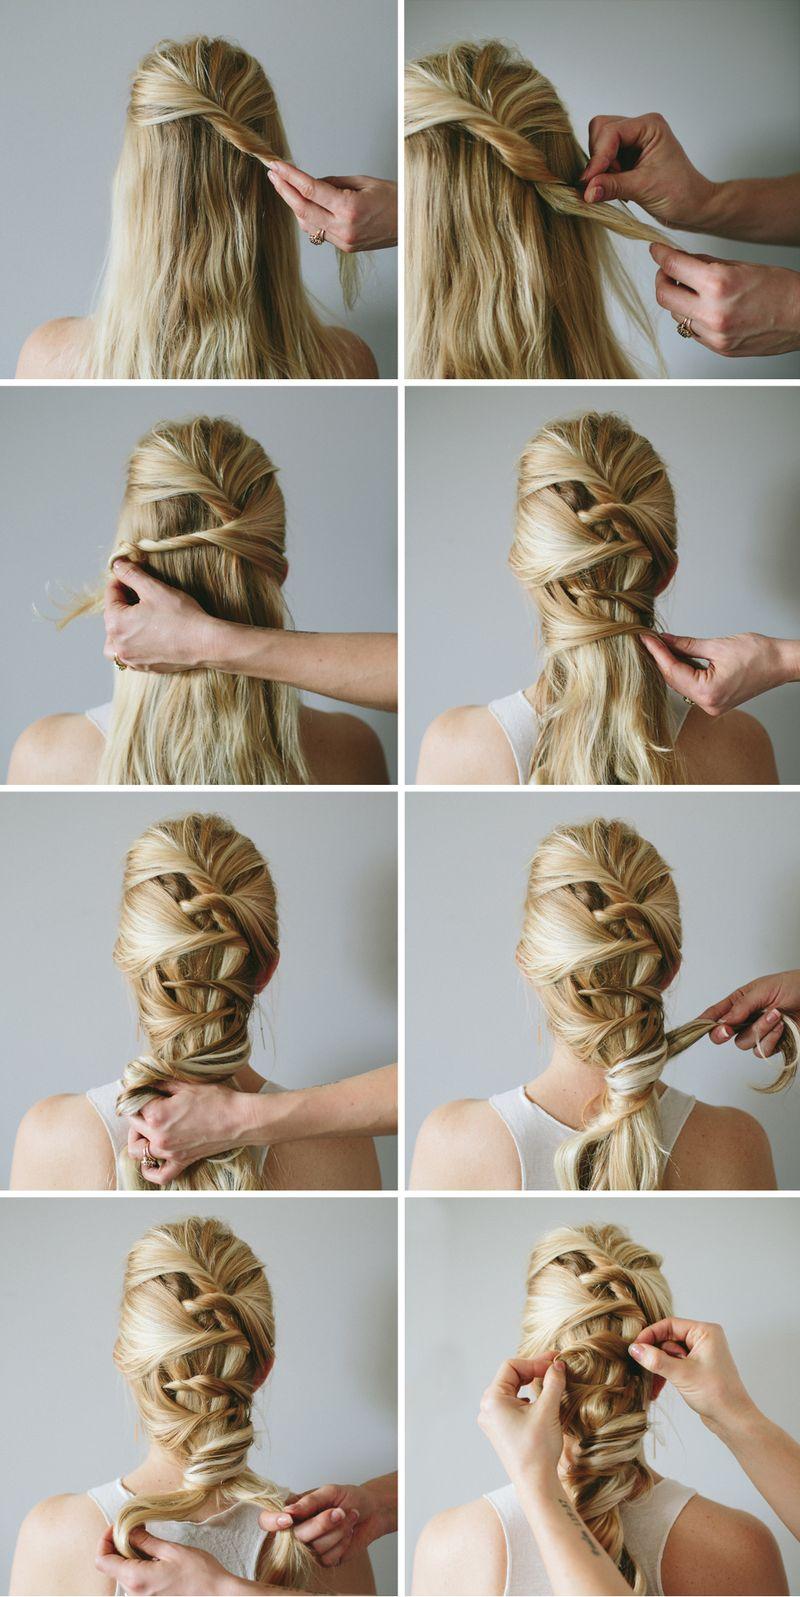 Pleasing Steps Of Hair Braiding Braids Short Hairstyles Gunalazisus